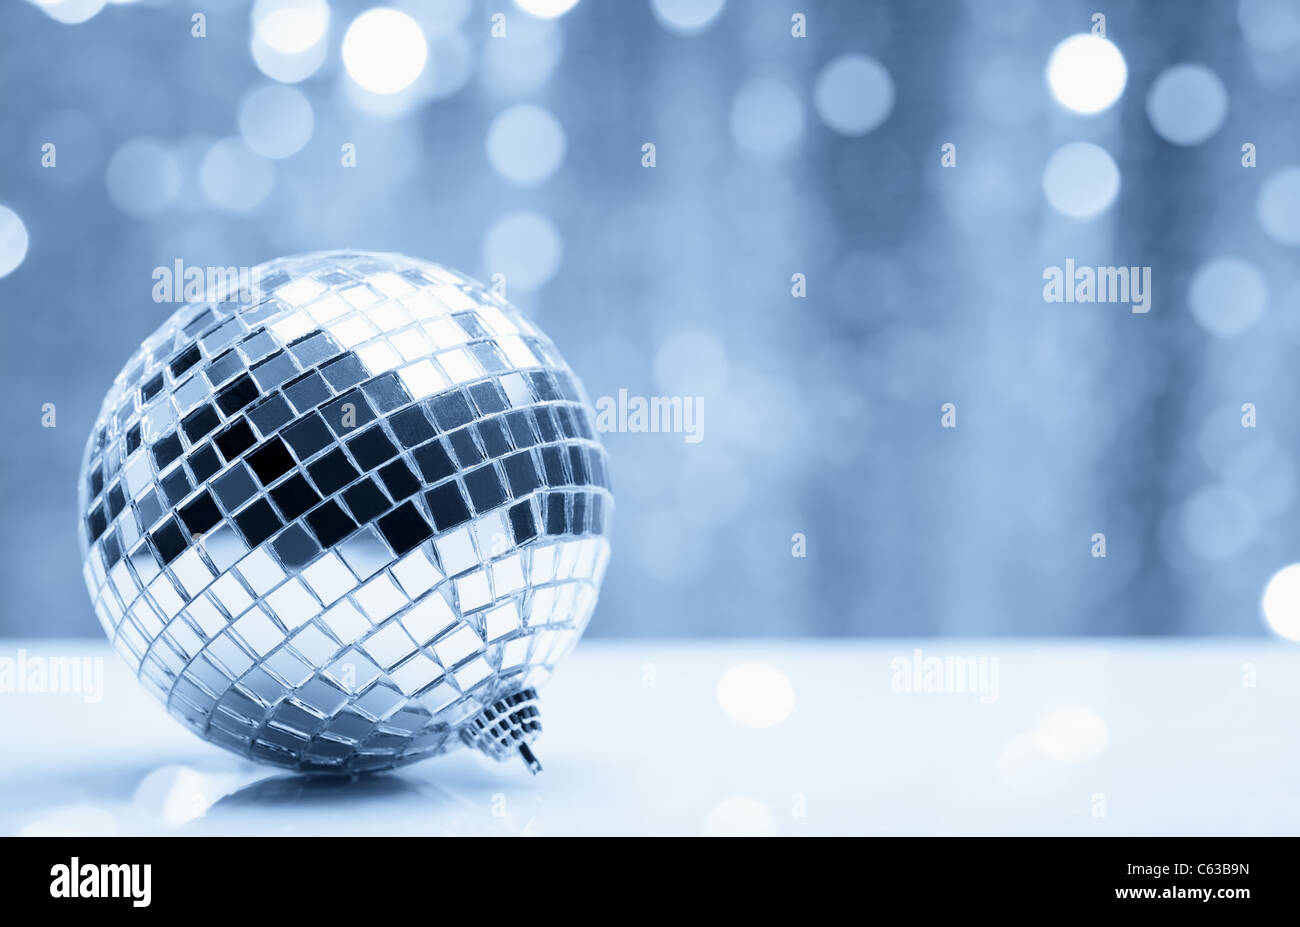 Shiny christmas ball over blurry background. Shallow Dof. - Stock Image